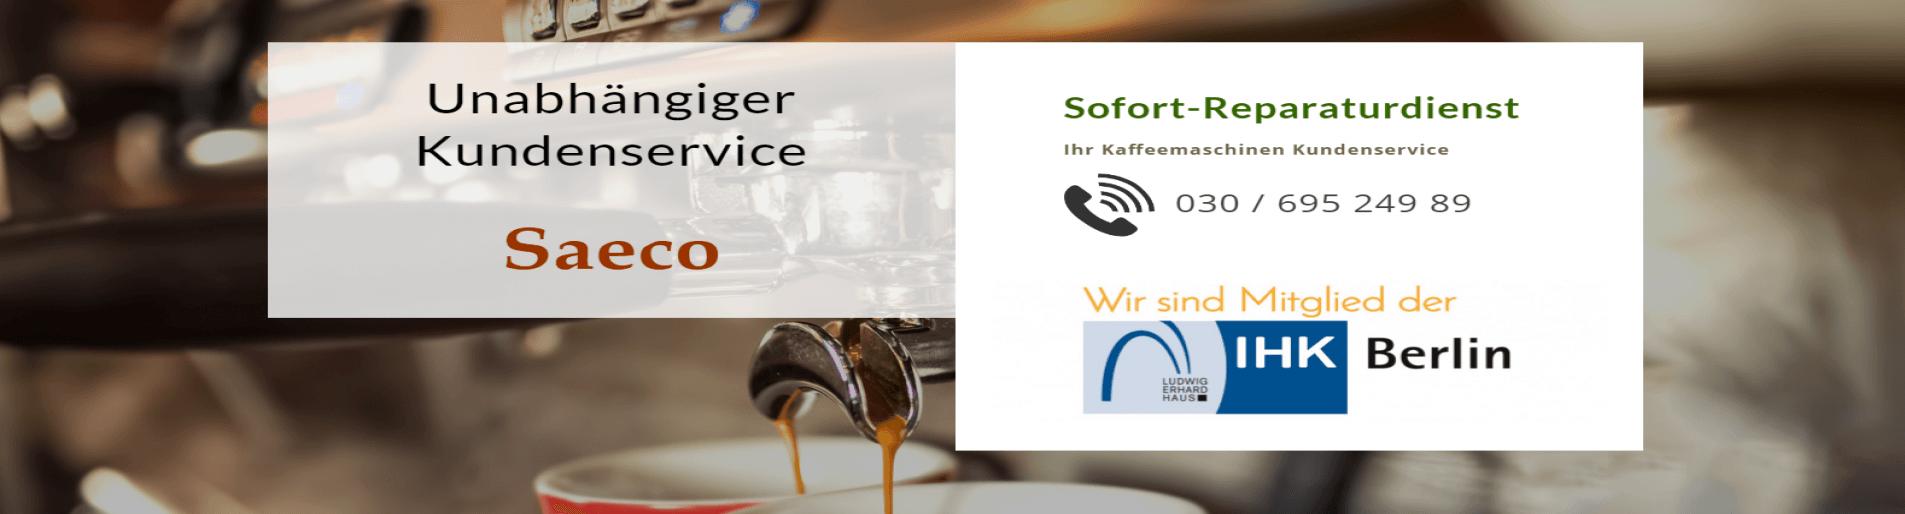 Saeco Kaffeemaschinen Reparatur